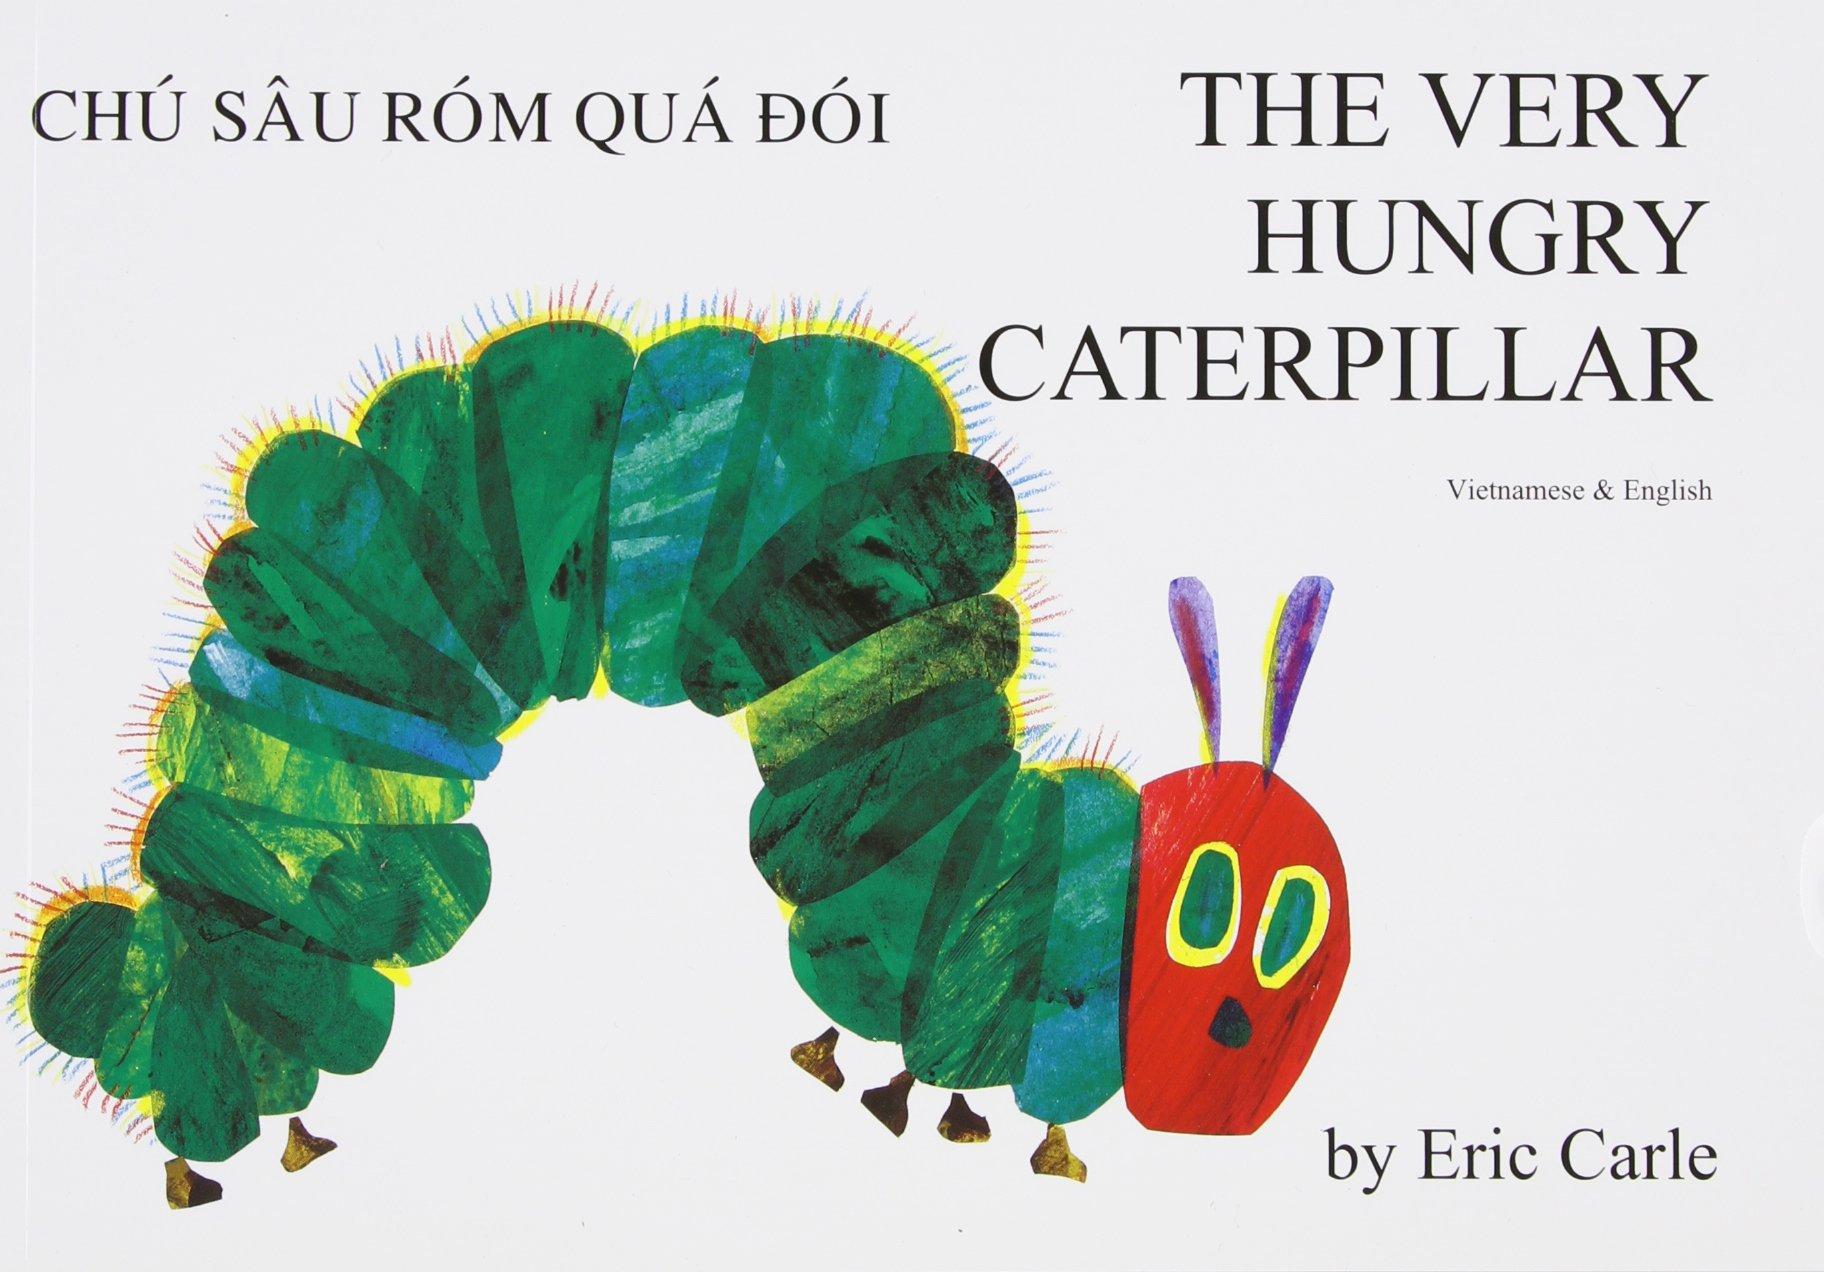 The Very Hungry Caterpillar/Chu Sau Rom Qua Doi/English/Vietnamese (Vietnamese and English Edition)